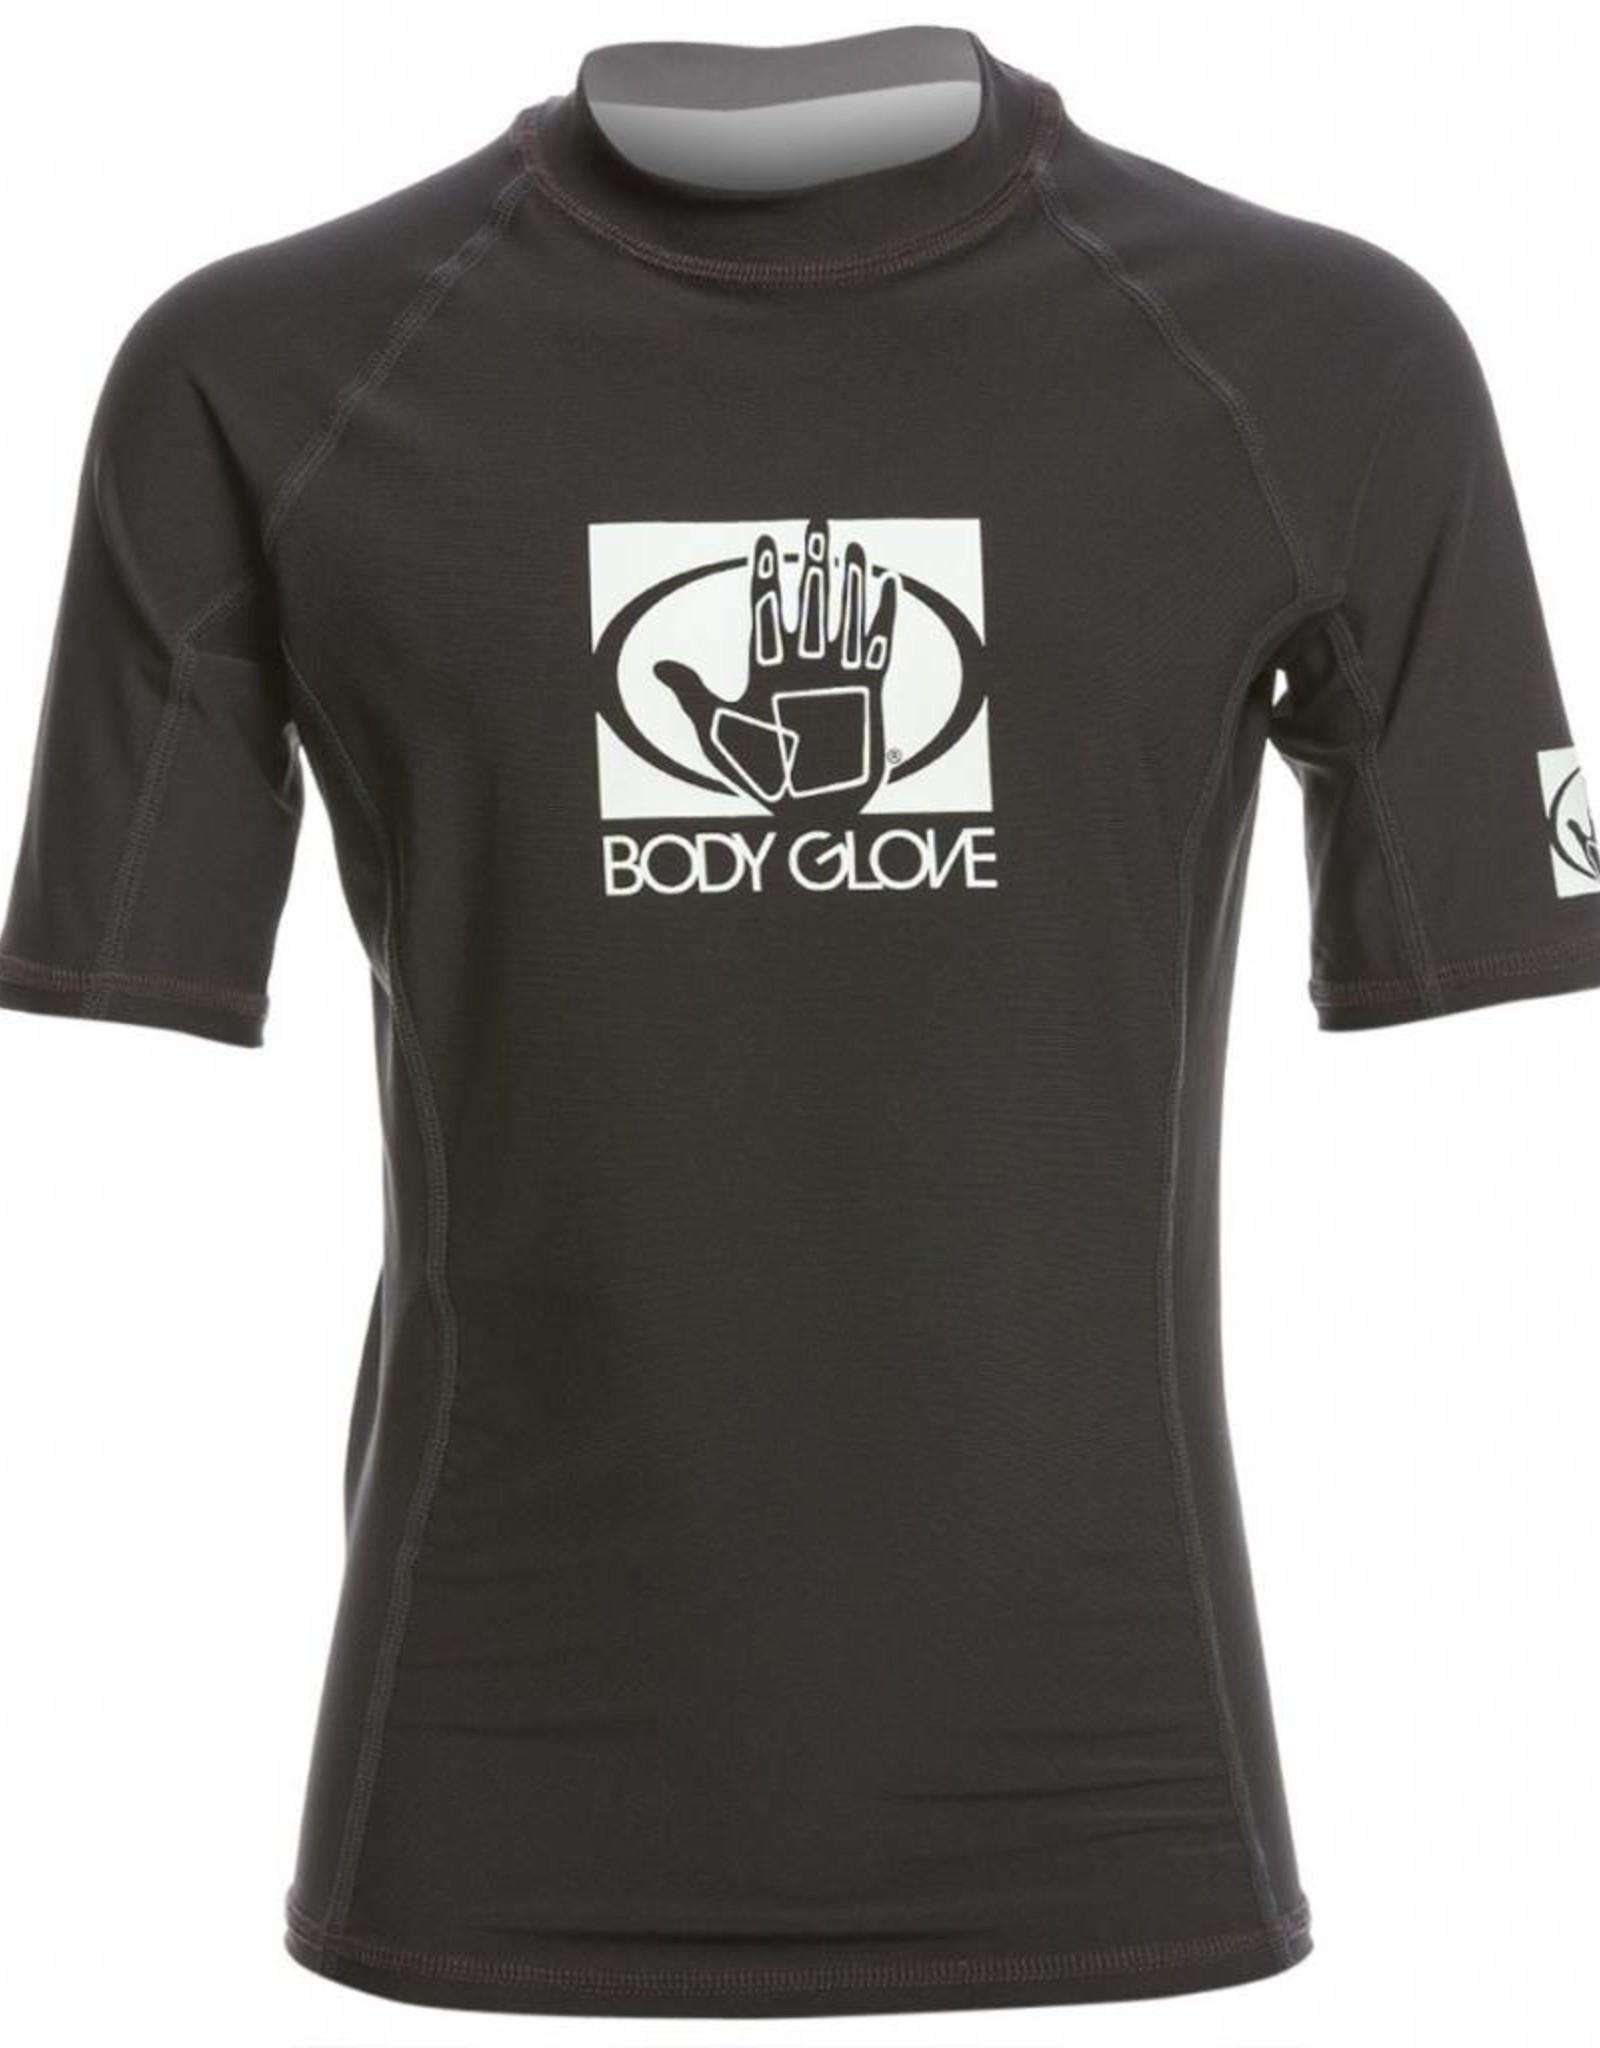 Body Glove Body Glove Men's Basic Short Sleeve Fitted Rashguard